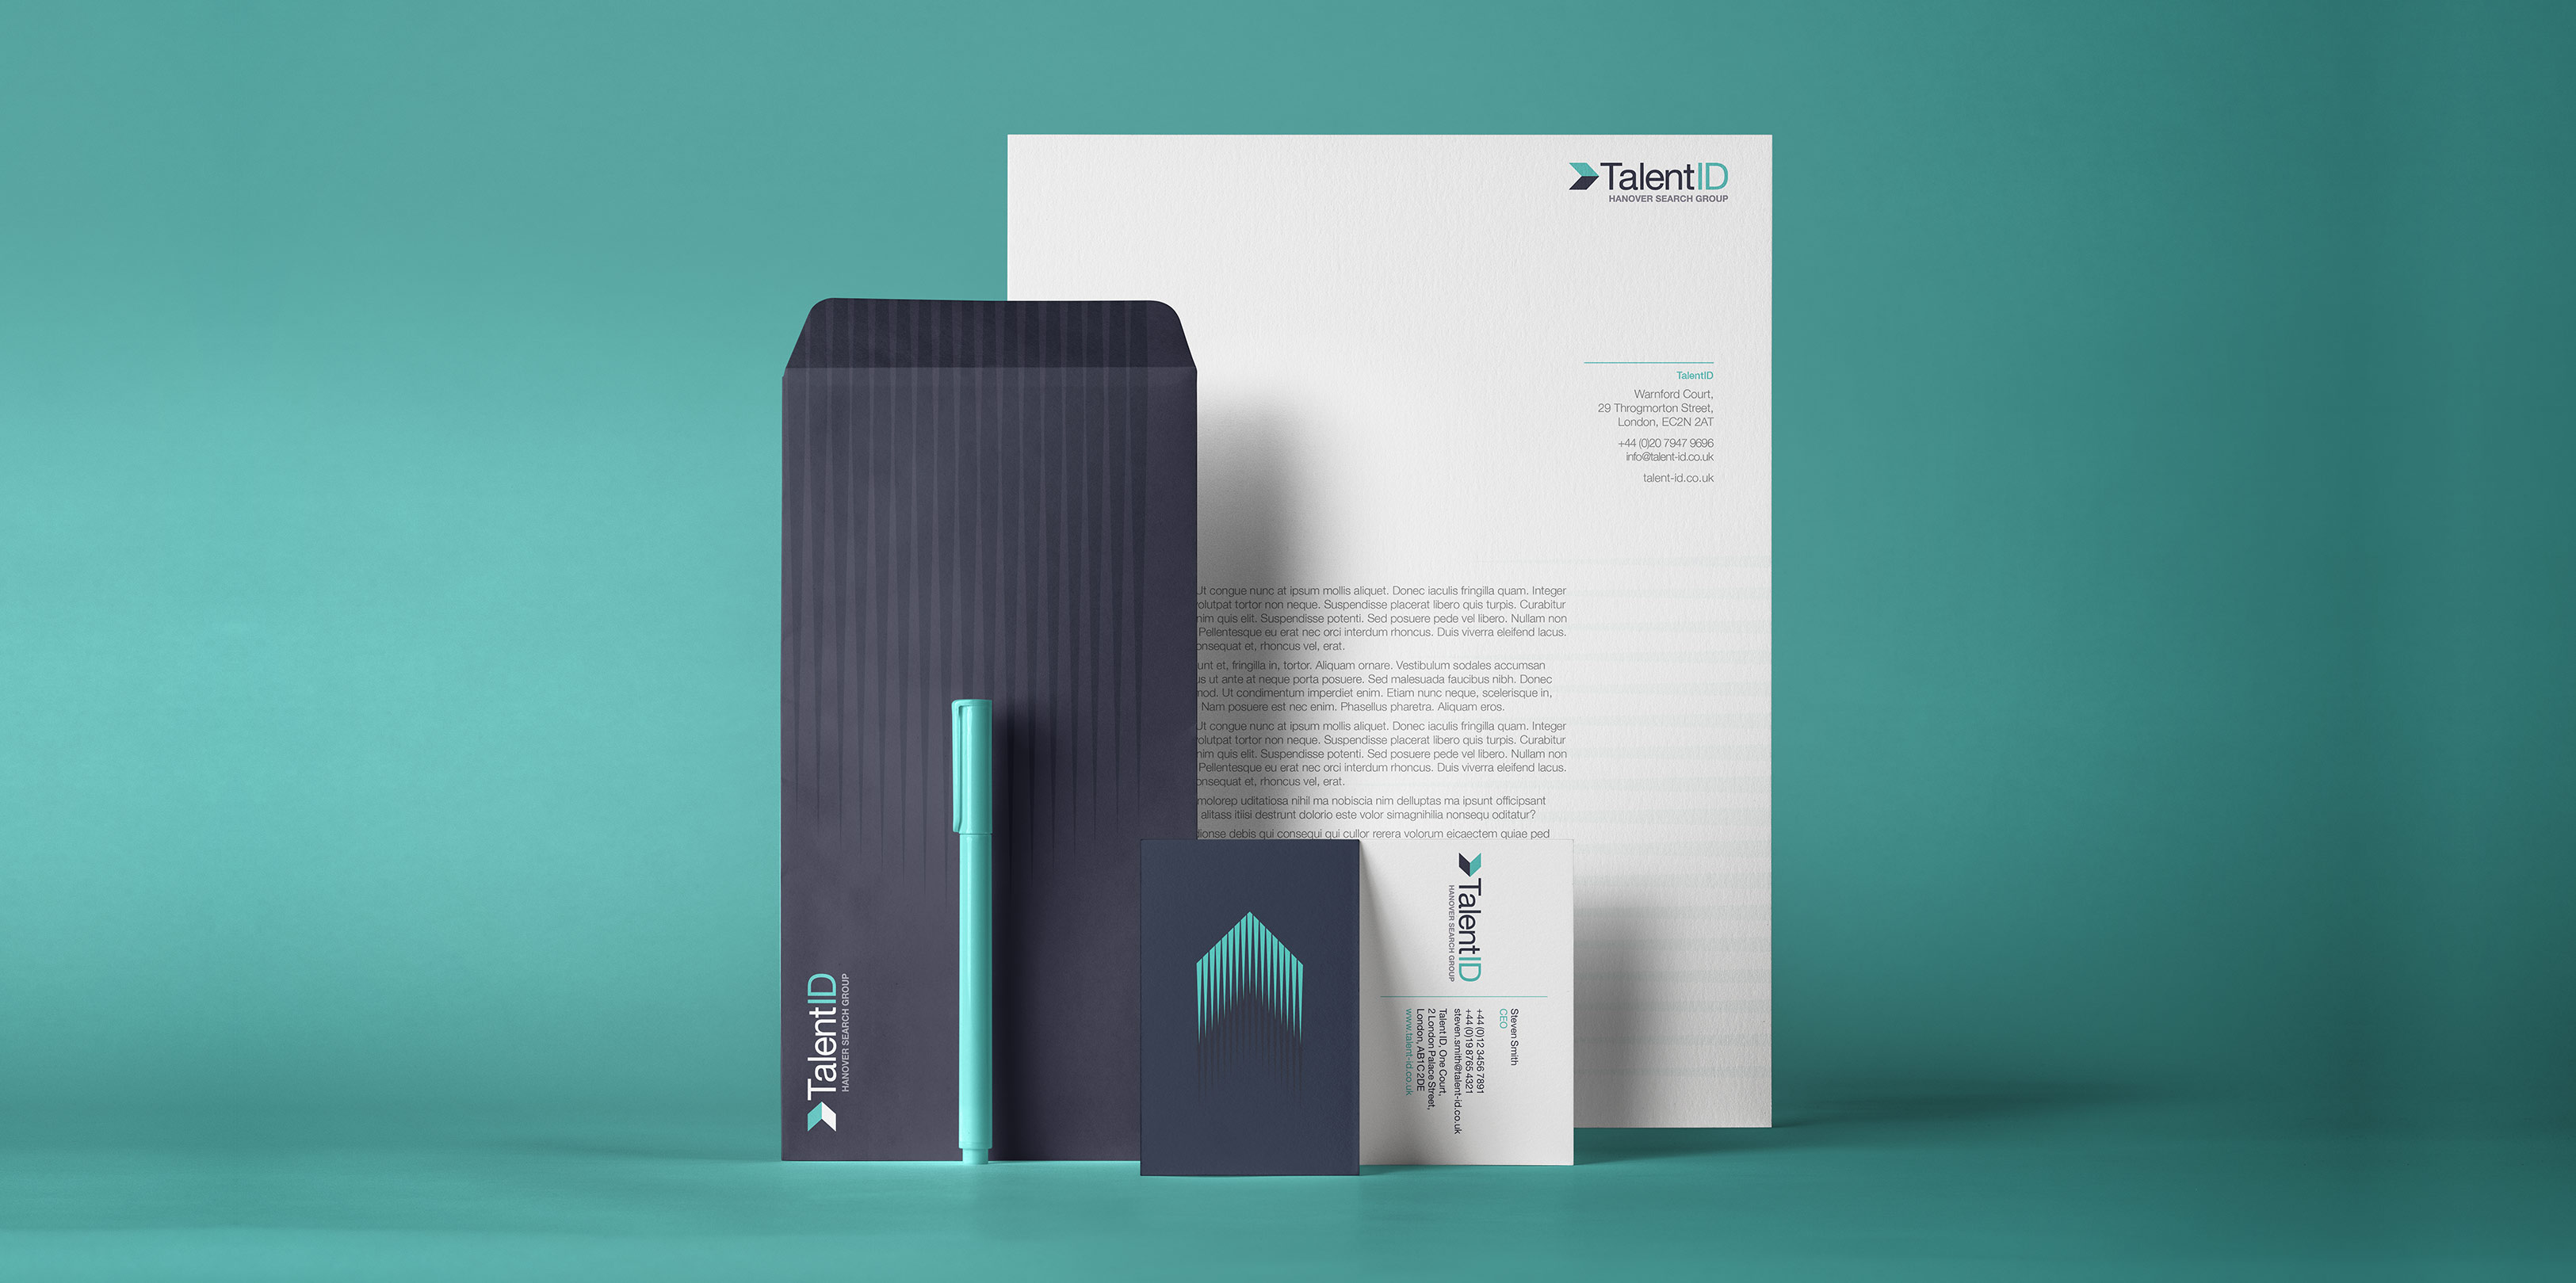 TalentID Stationery Design